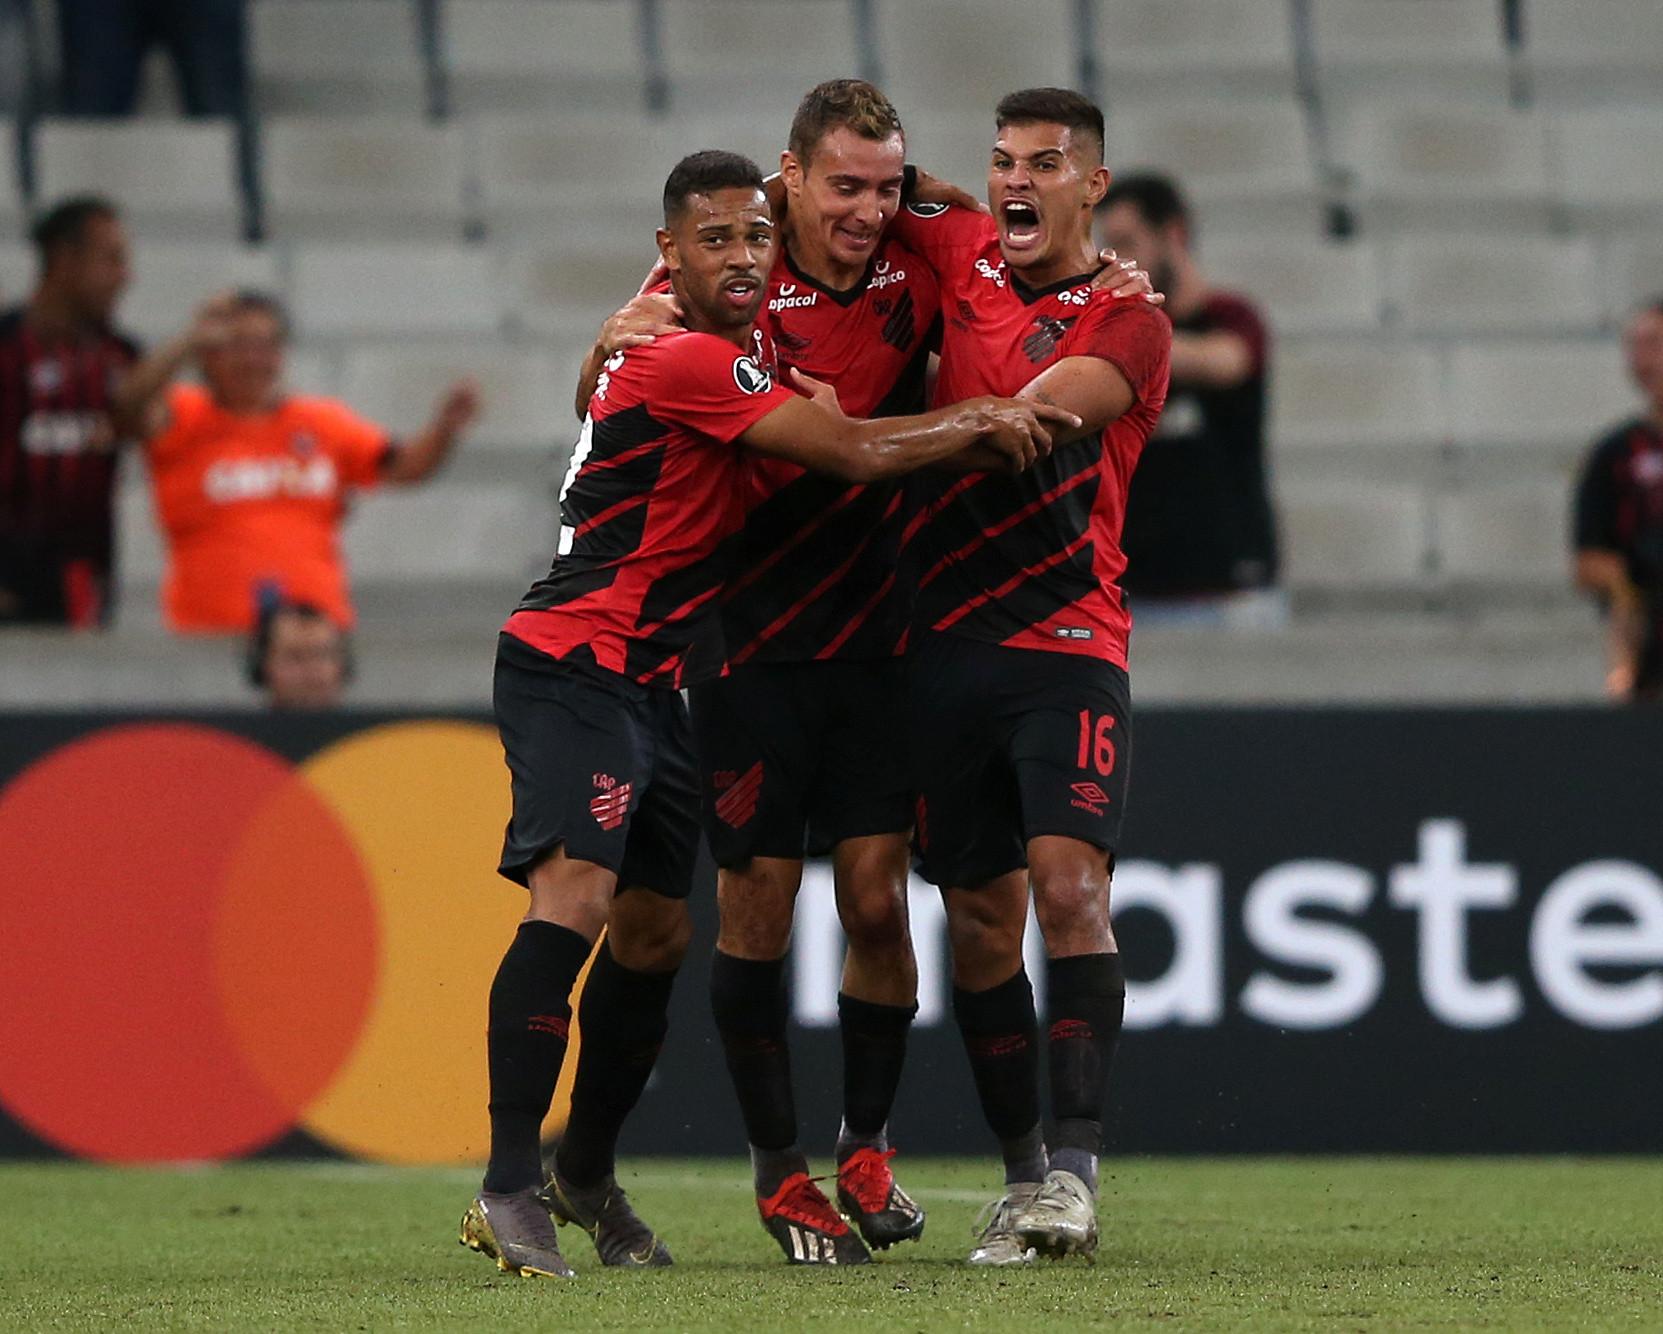 Rodada da Libertadores teve 3 jogos; Athletico venceu a primeira